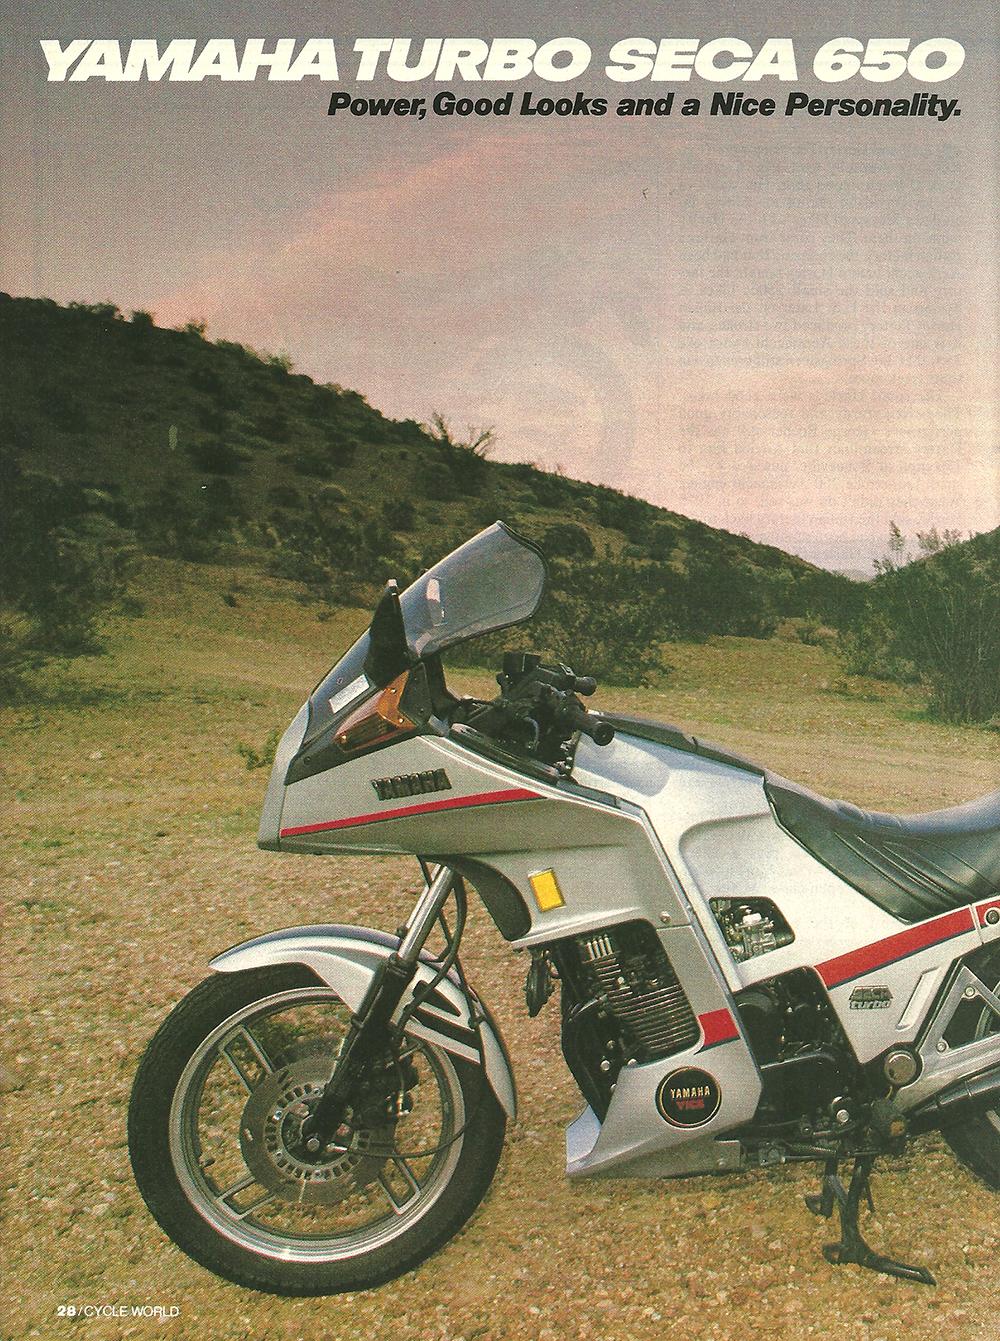 1982 Yamaha Turbo Seca 650 road test 01.jpg